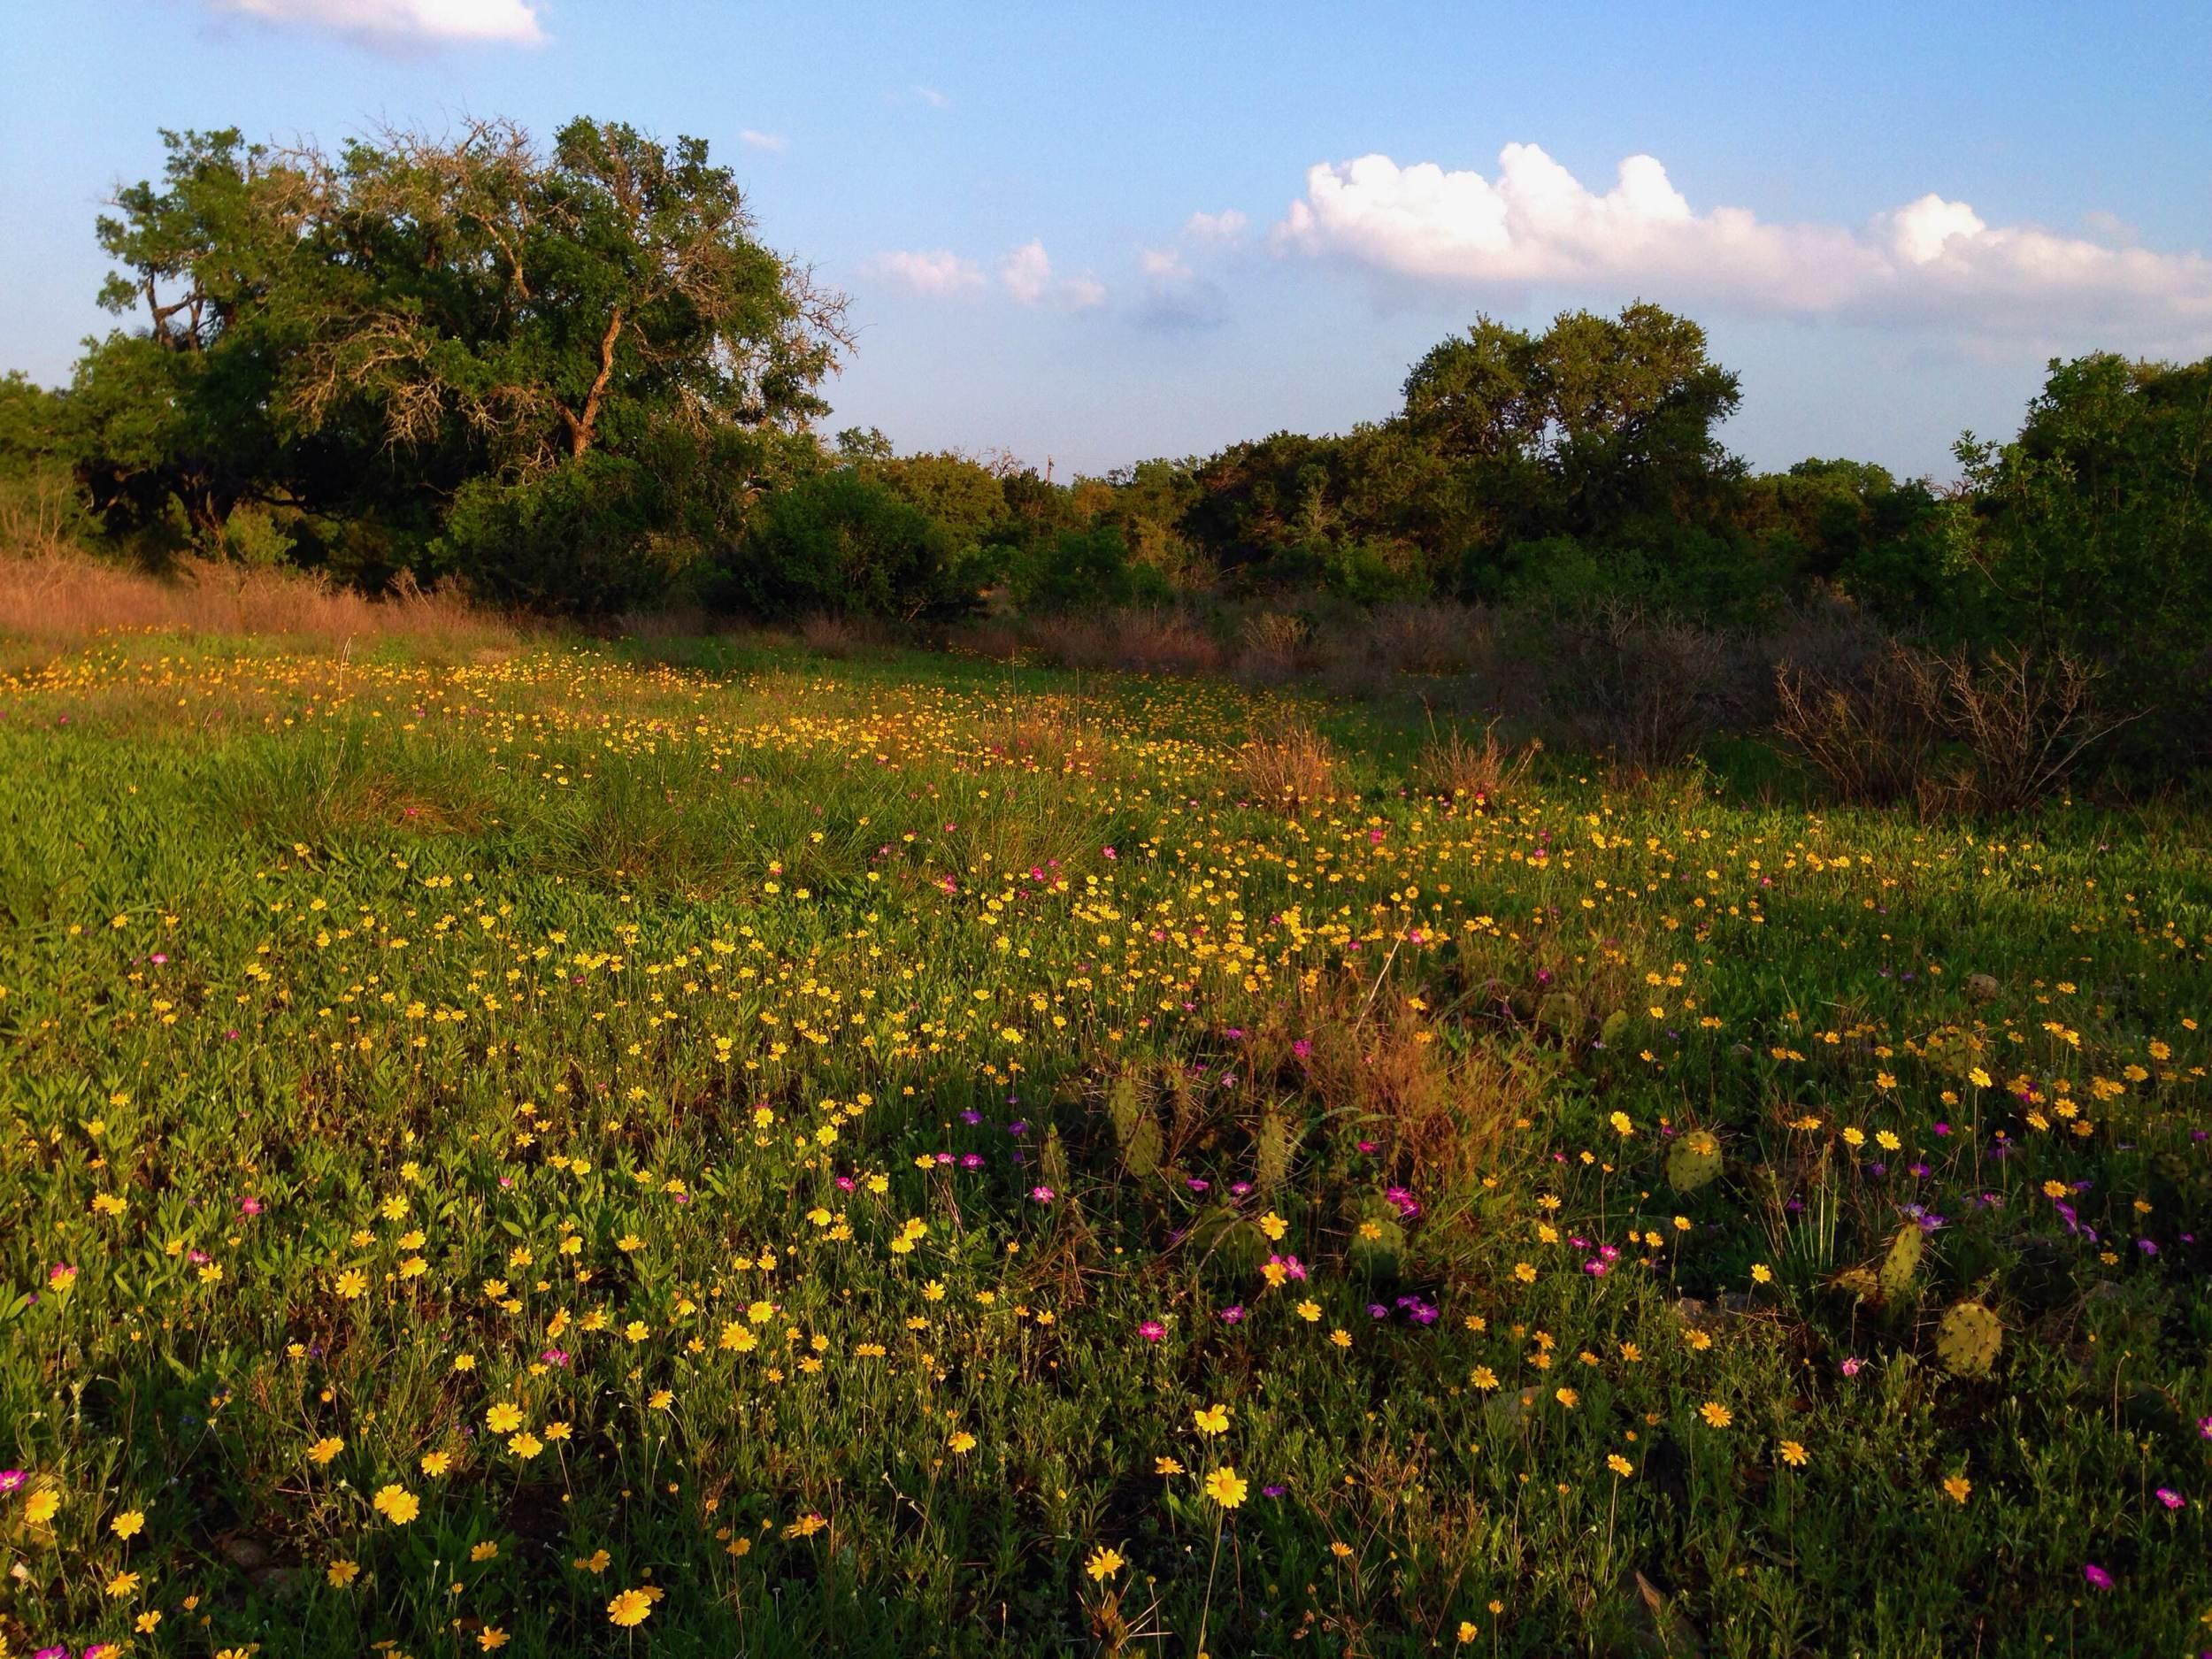 Field of Tetraneuris scaposa, Four nerve daisy